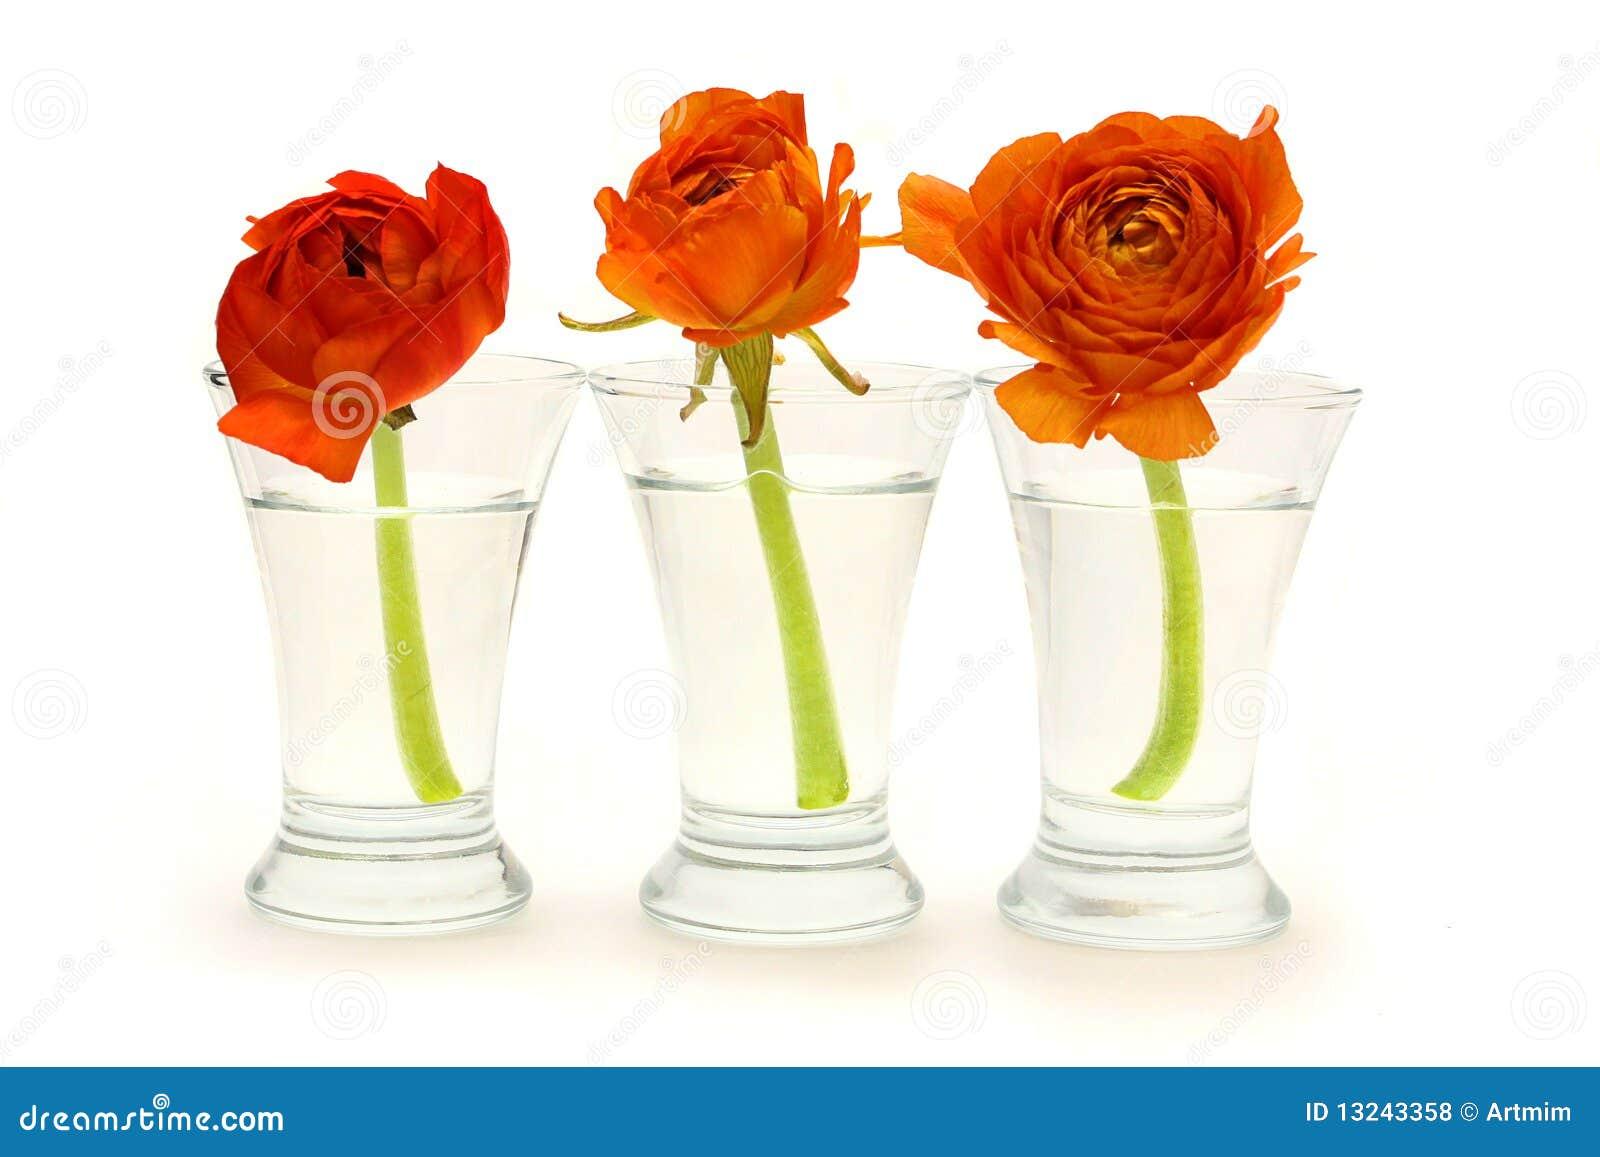 Three Glass Vases With Orange Flowers Royalty Free Stock ...